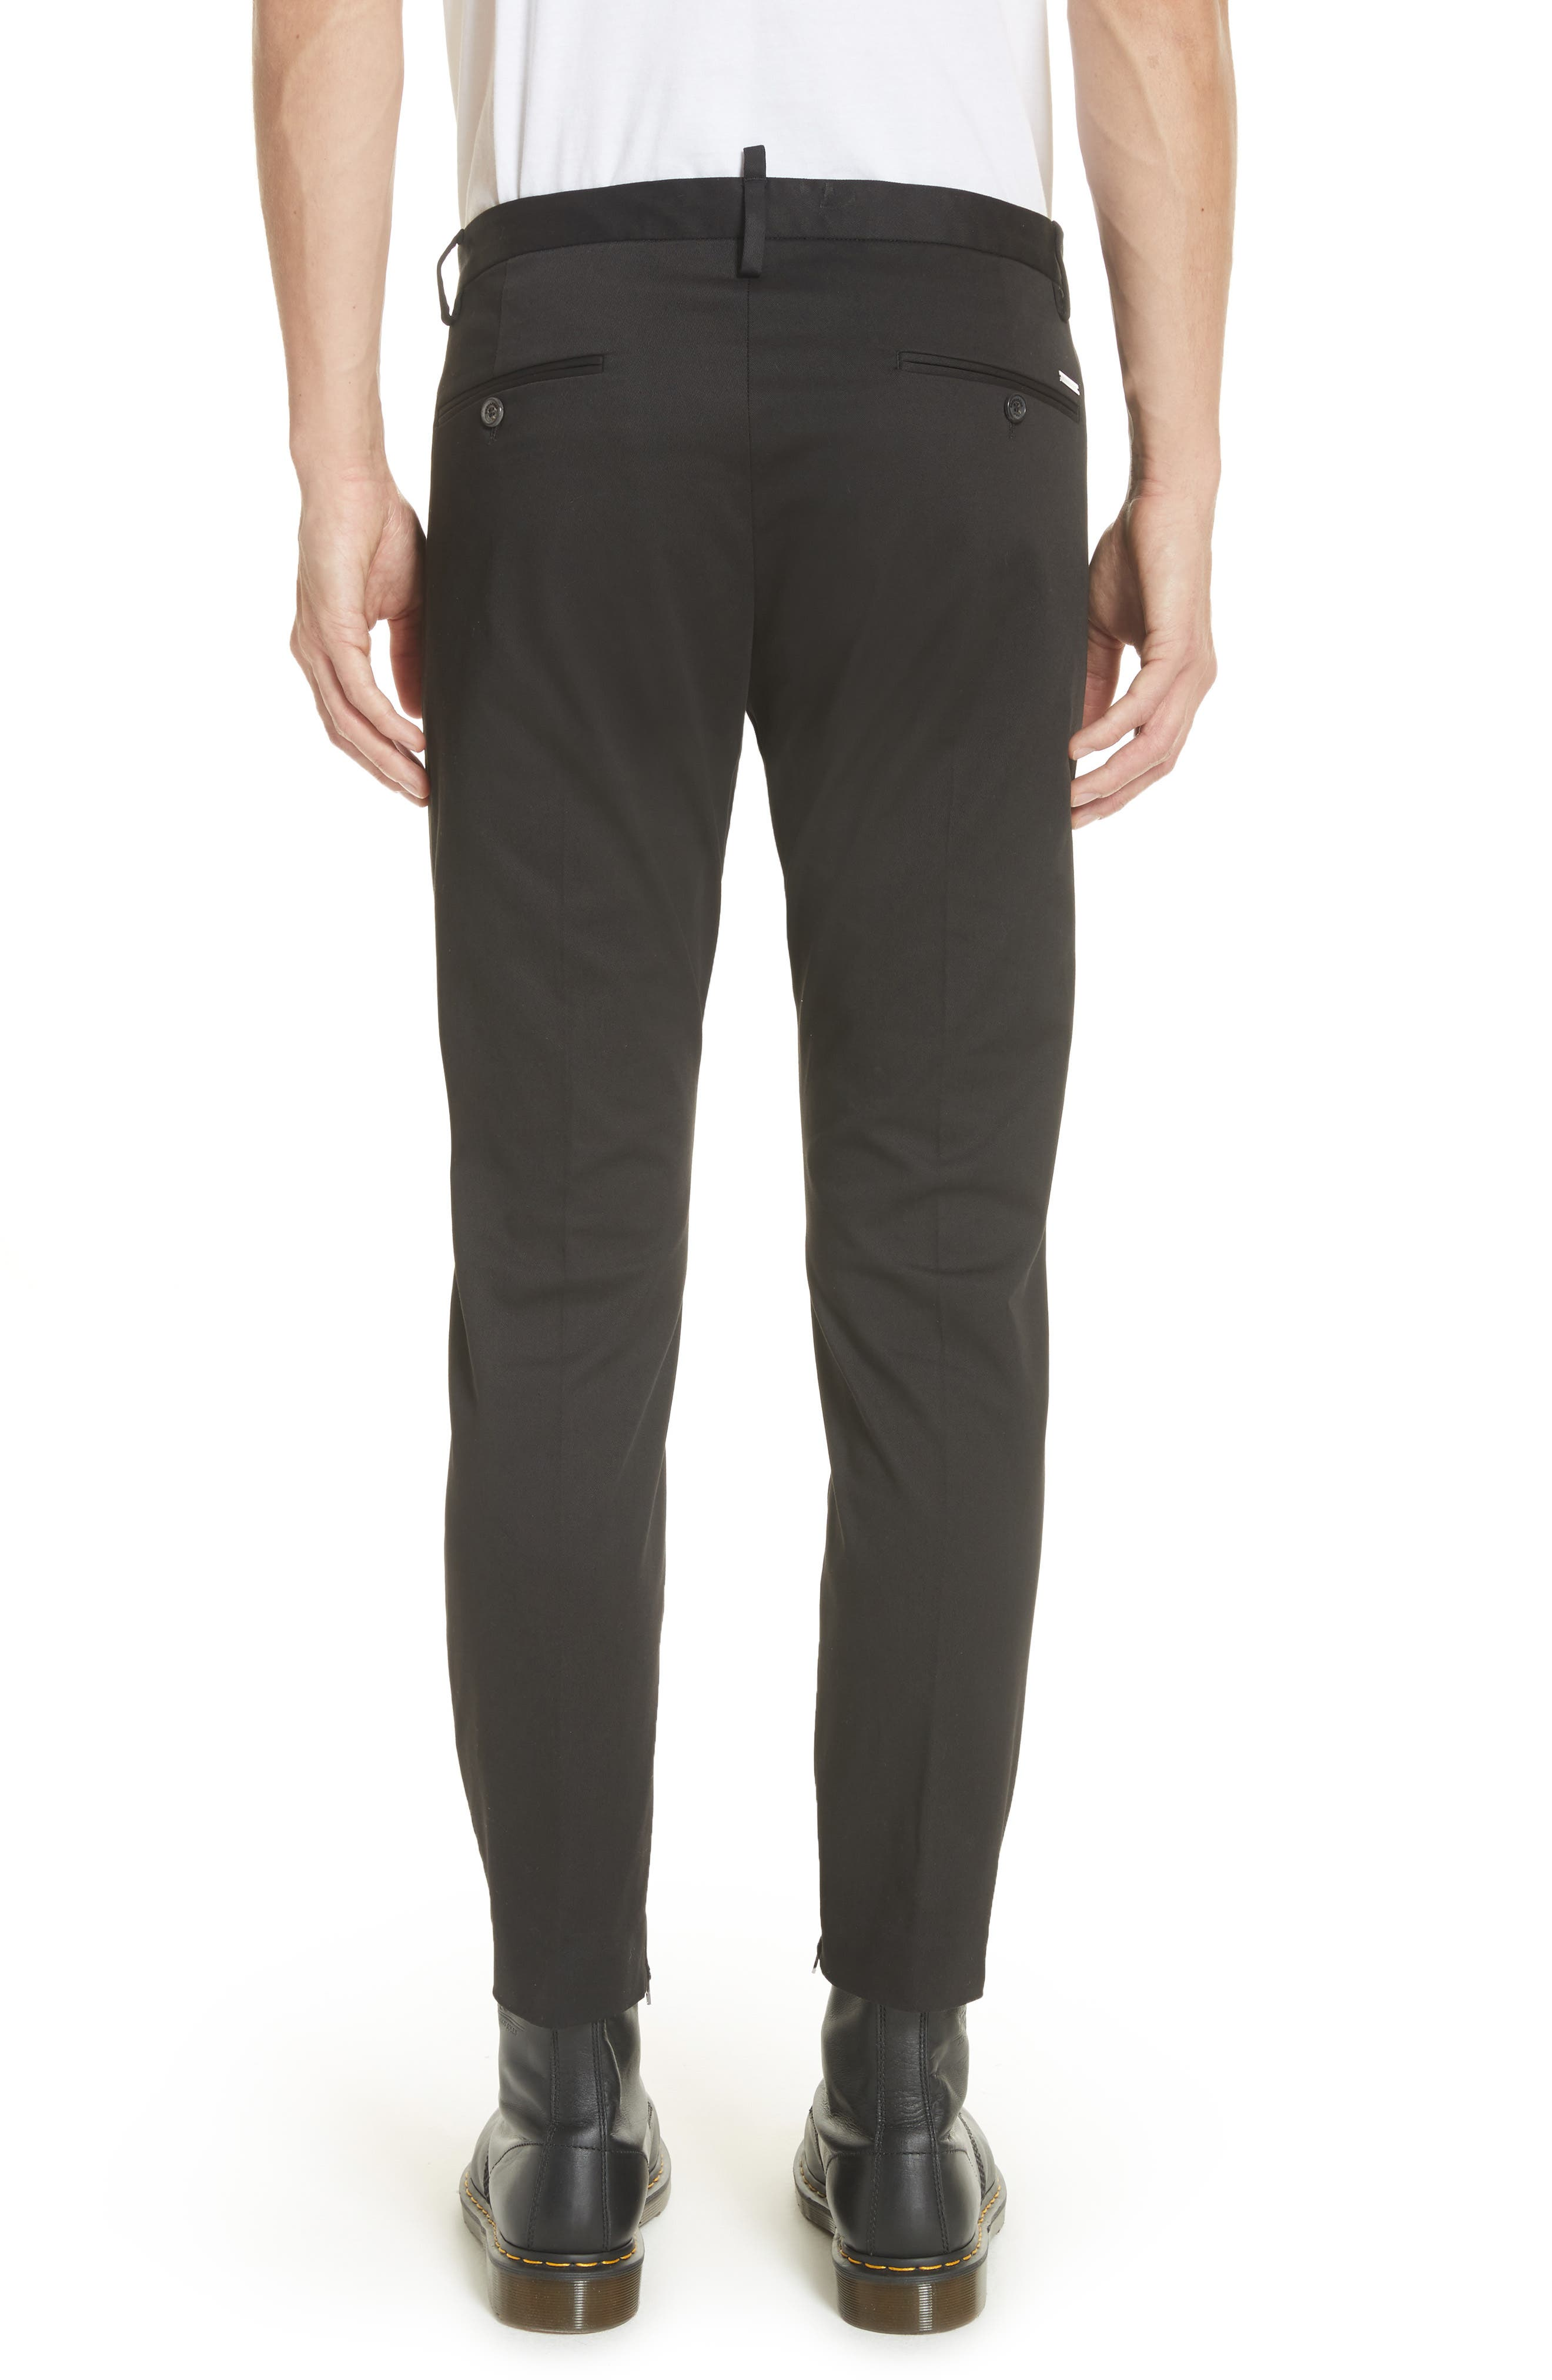 Dan Skinny Fit Cropped Trousers,                             Alternate thumbnail 2, color,                             Black